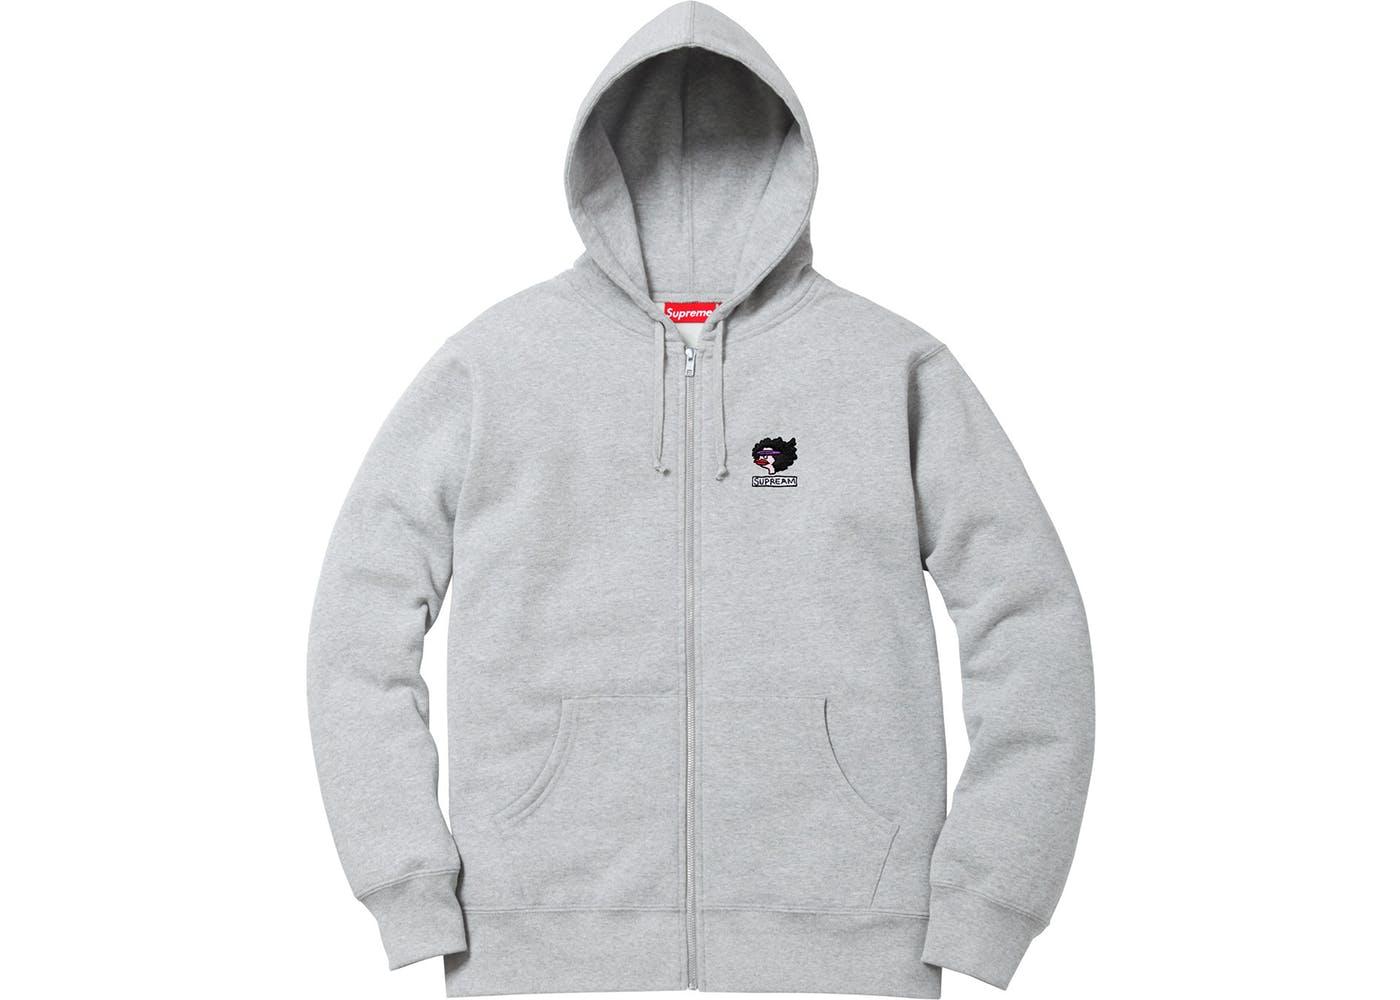 e97c5d2e766d Supreme Gonz Ramm Zip Up Sweatshirt Heather Grey - StockX News